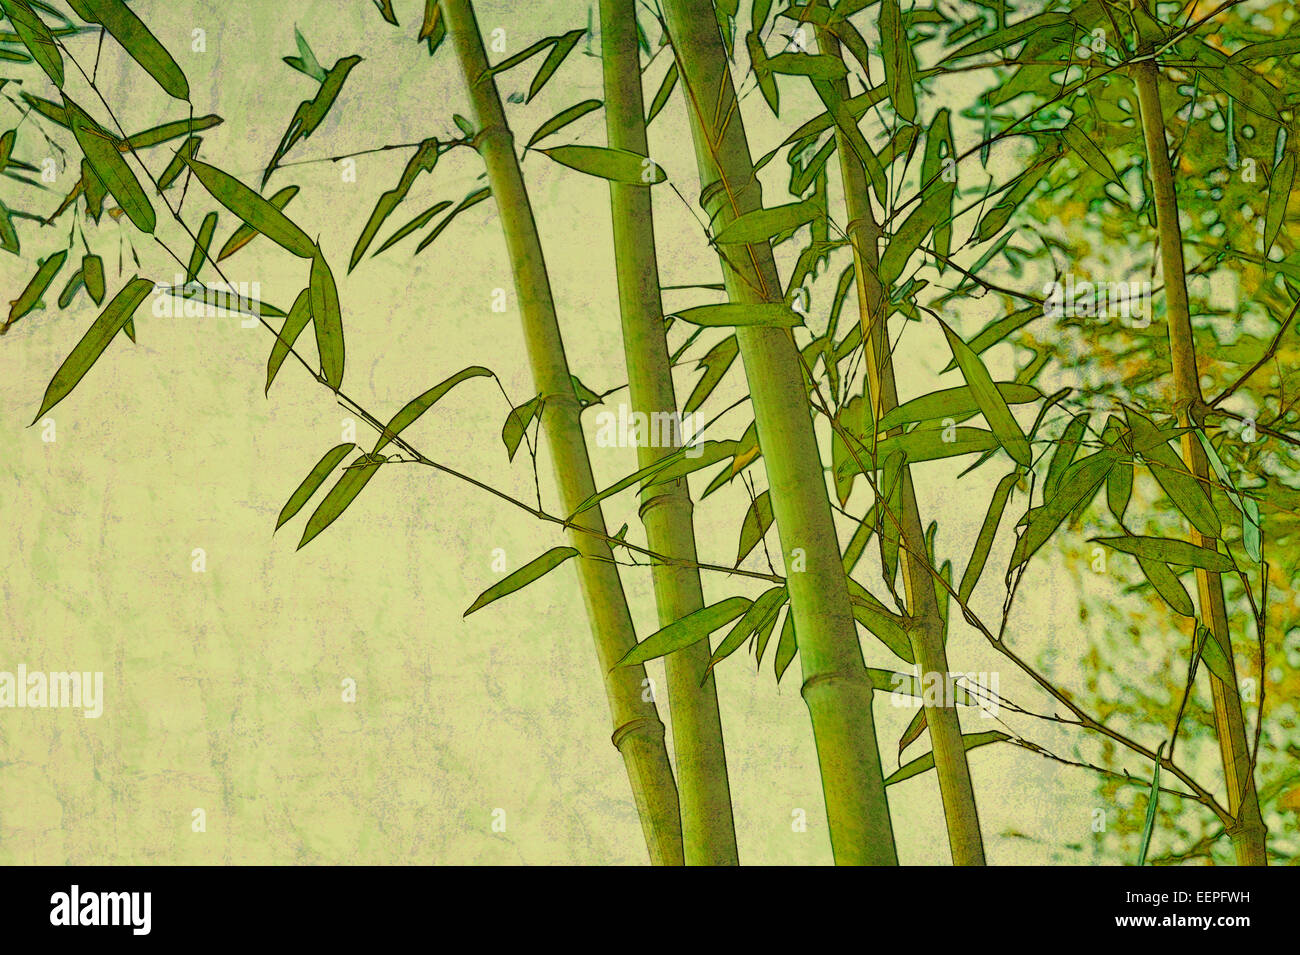 grunge-vintage-zen-bamboo-green-natural-textured-background-mixed-EEPFWH.jpg